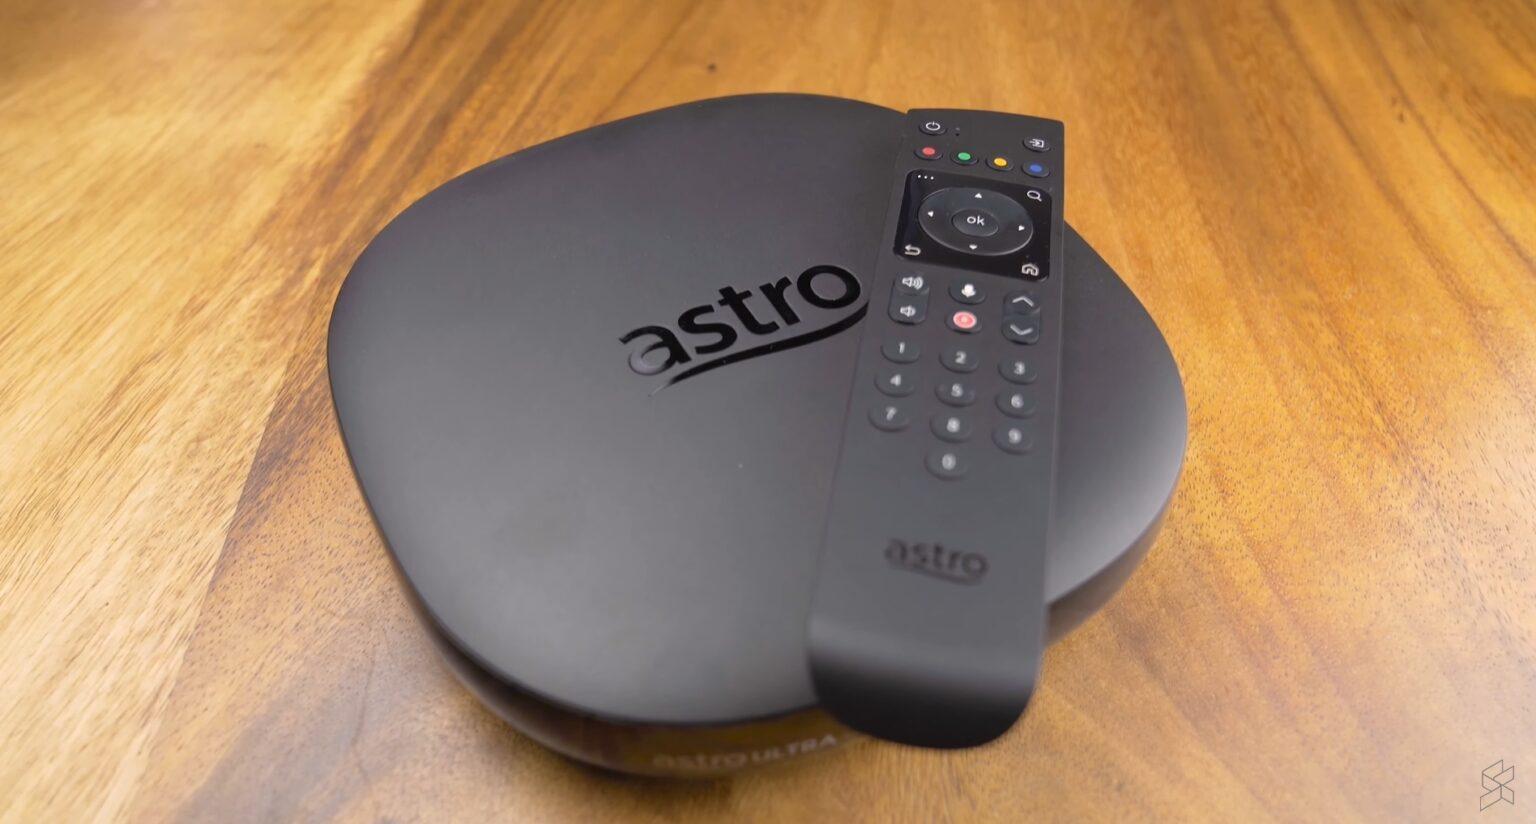 Astro宣布,电影配套(Movies Pack)用户可以免费订阅Disney+ Hotstar一个月。-图摘自Soya Cincu-